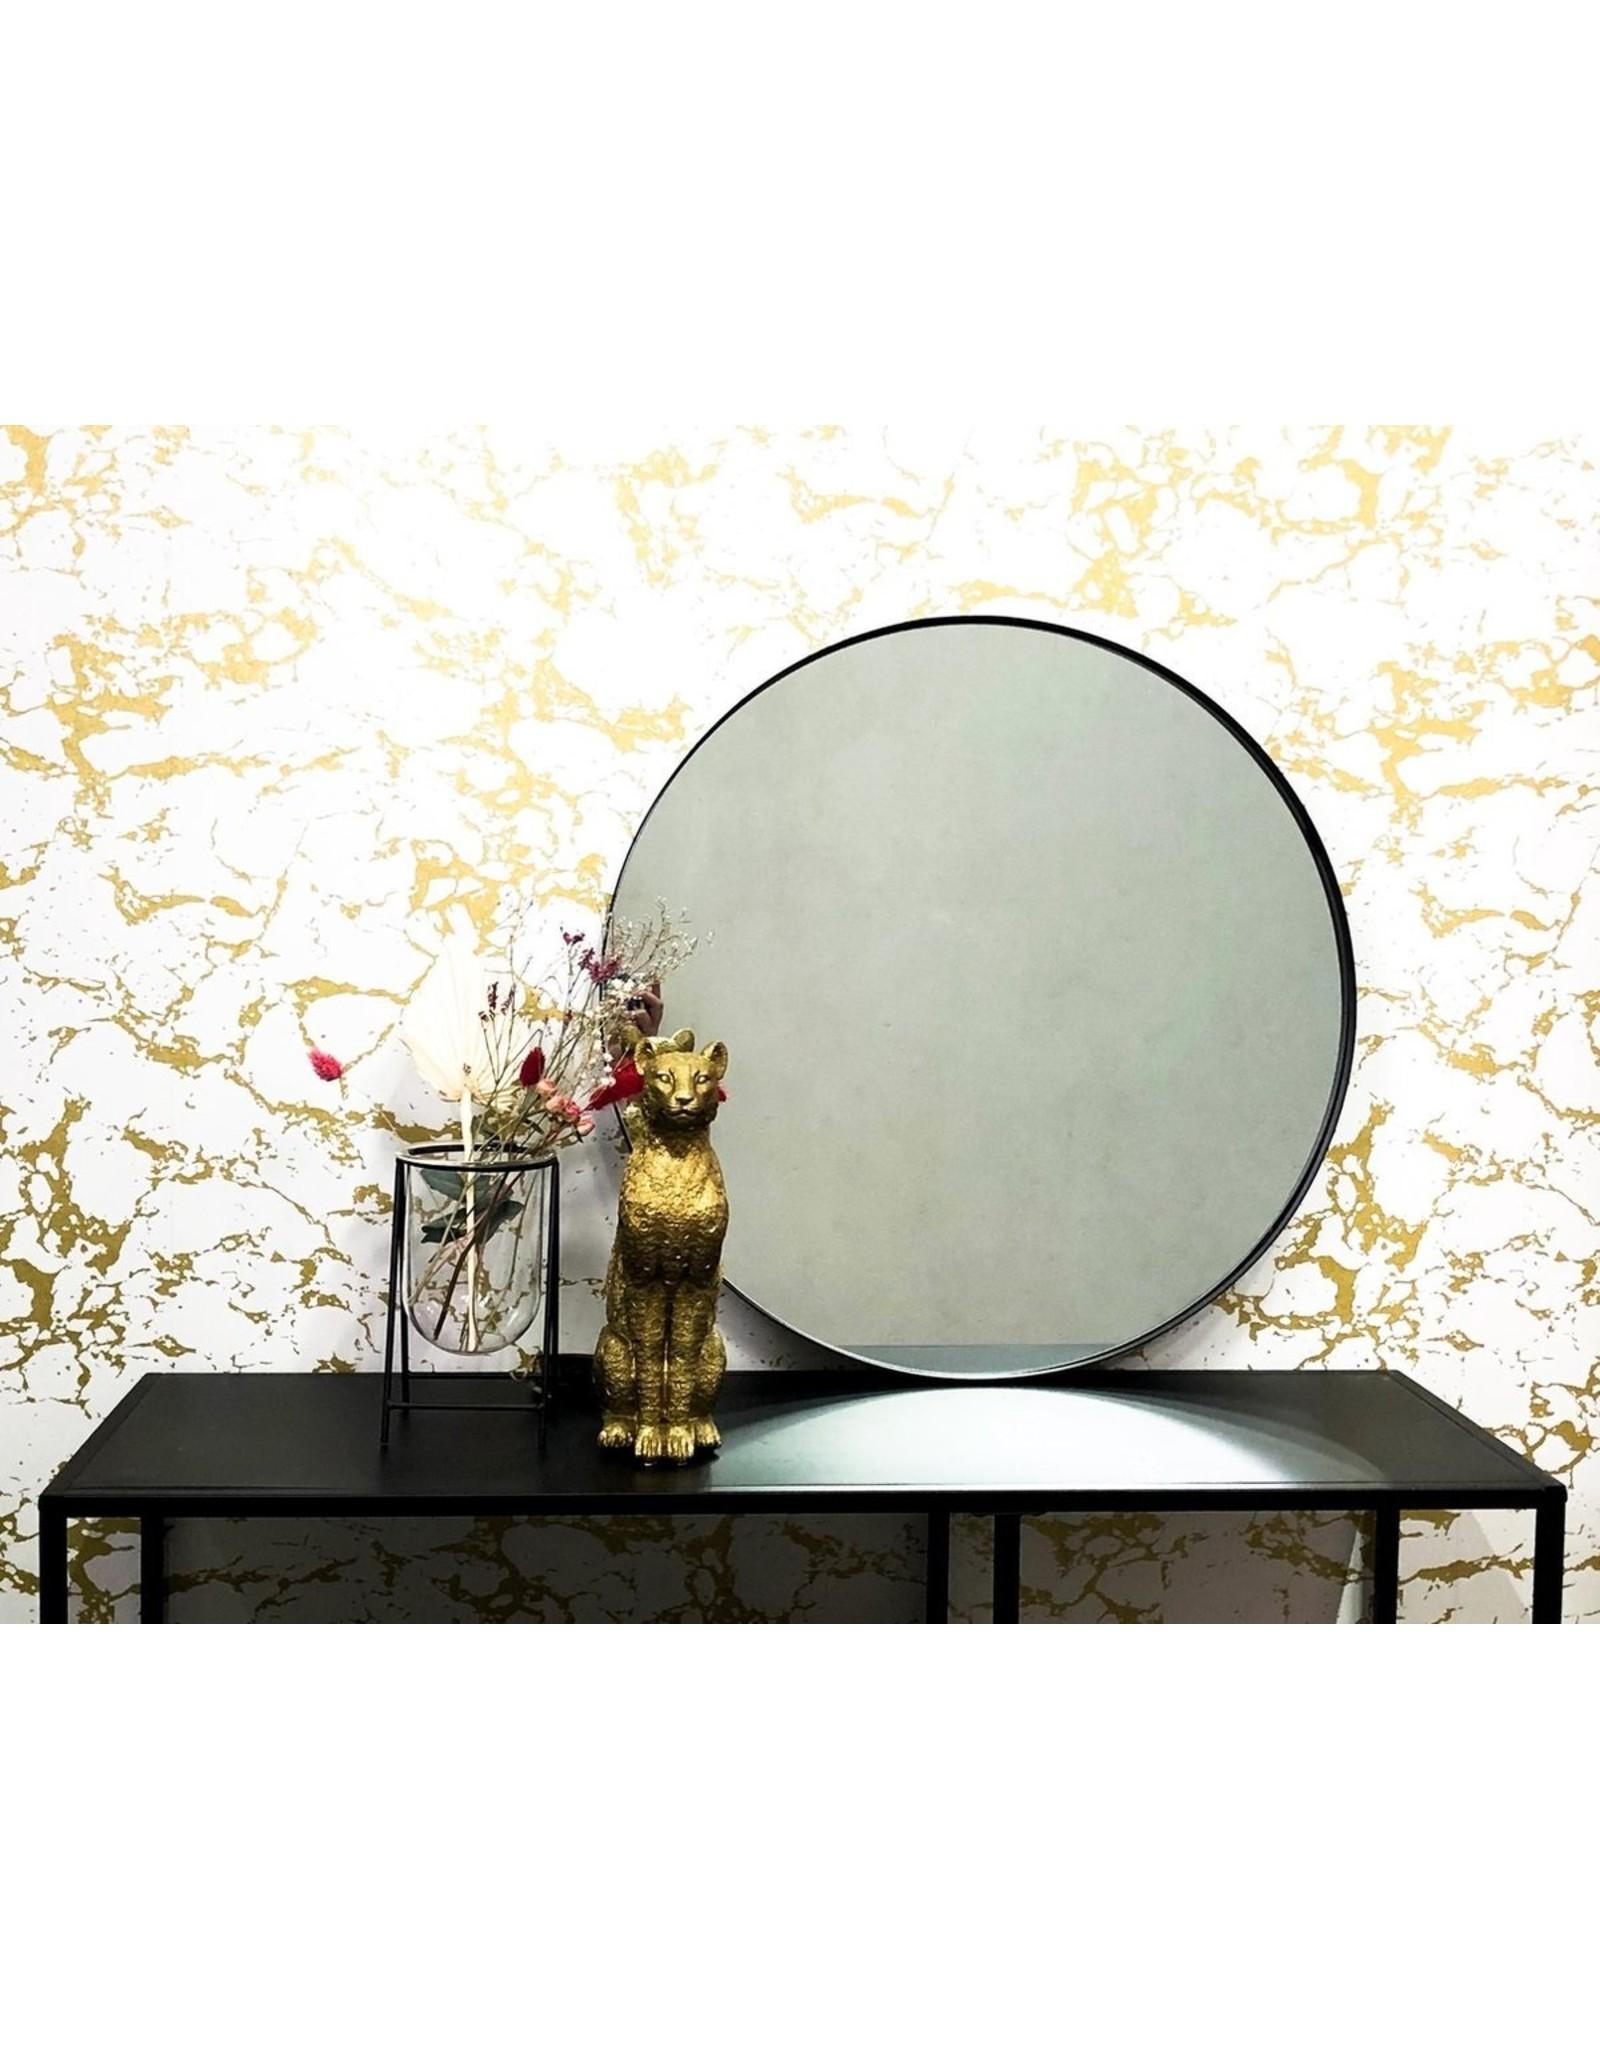 Parya Home Parya Home - Metalen Spiegel Rond - 60 cm - Zwart